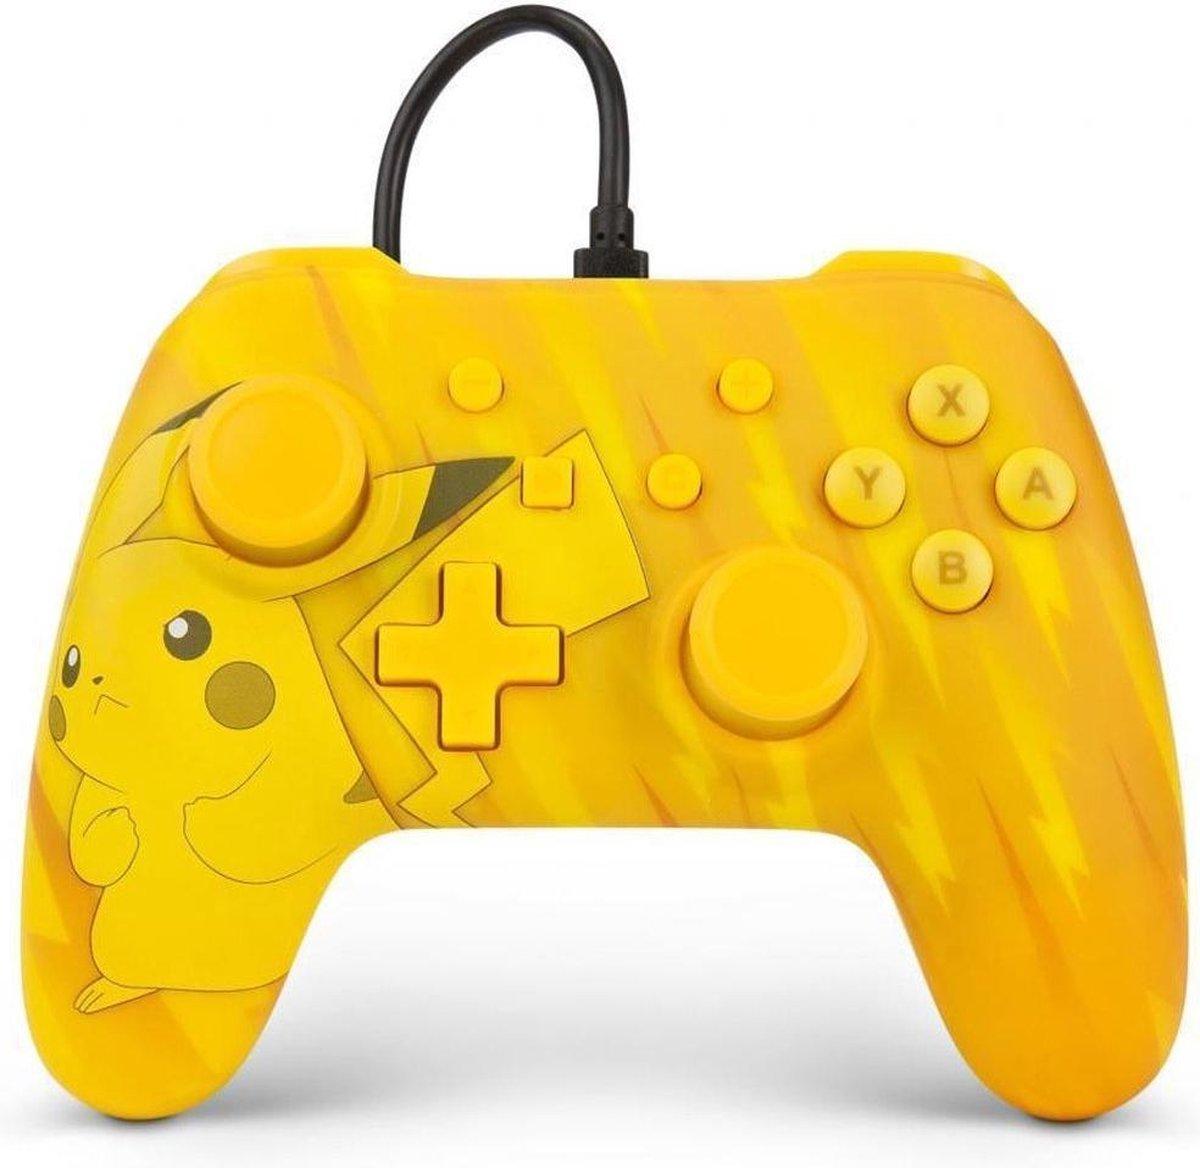 PowerA Pikachu Static Geel USB Gamepad Analoog/digitaal Nintendo Switch